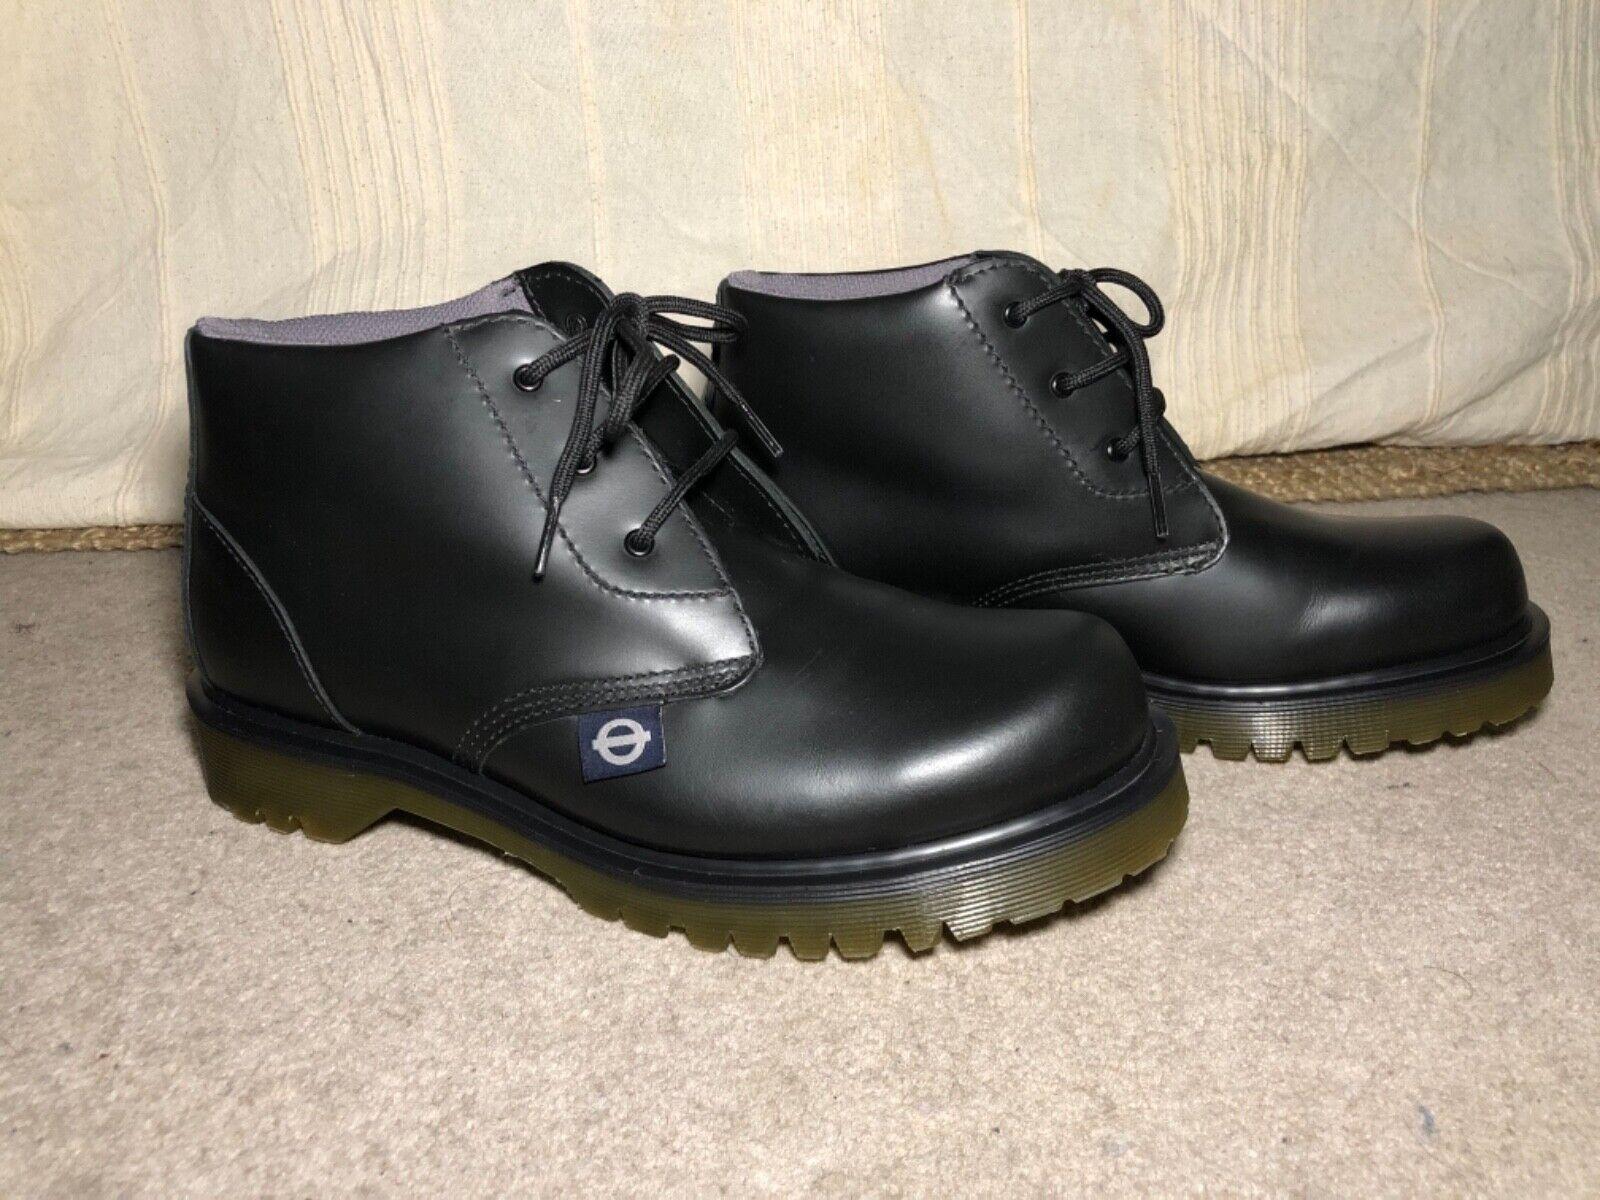 Mens Dr MartensLondon Underground Black Leather Safety Shoe Boots UK 8.5